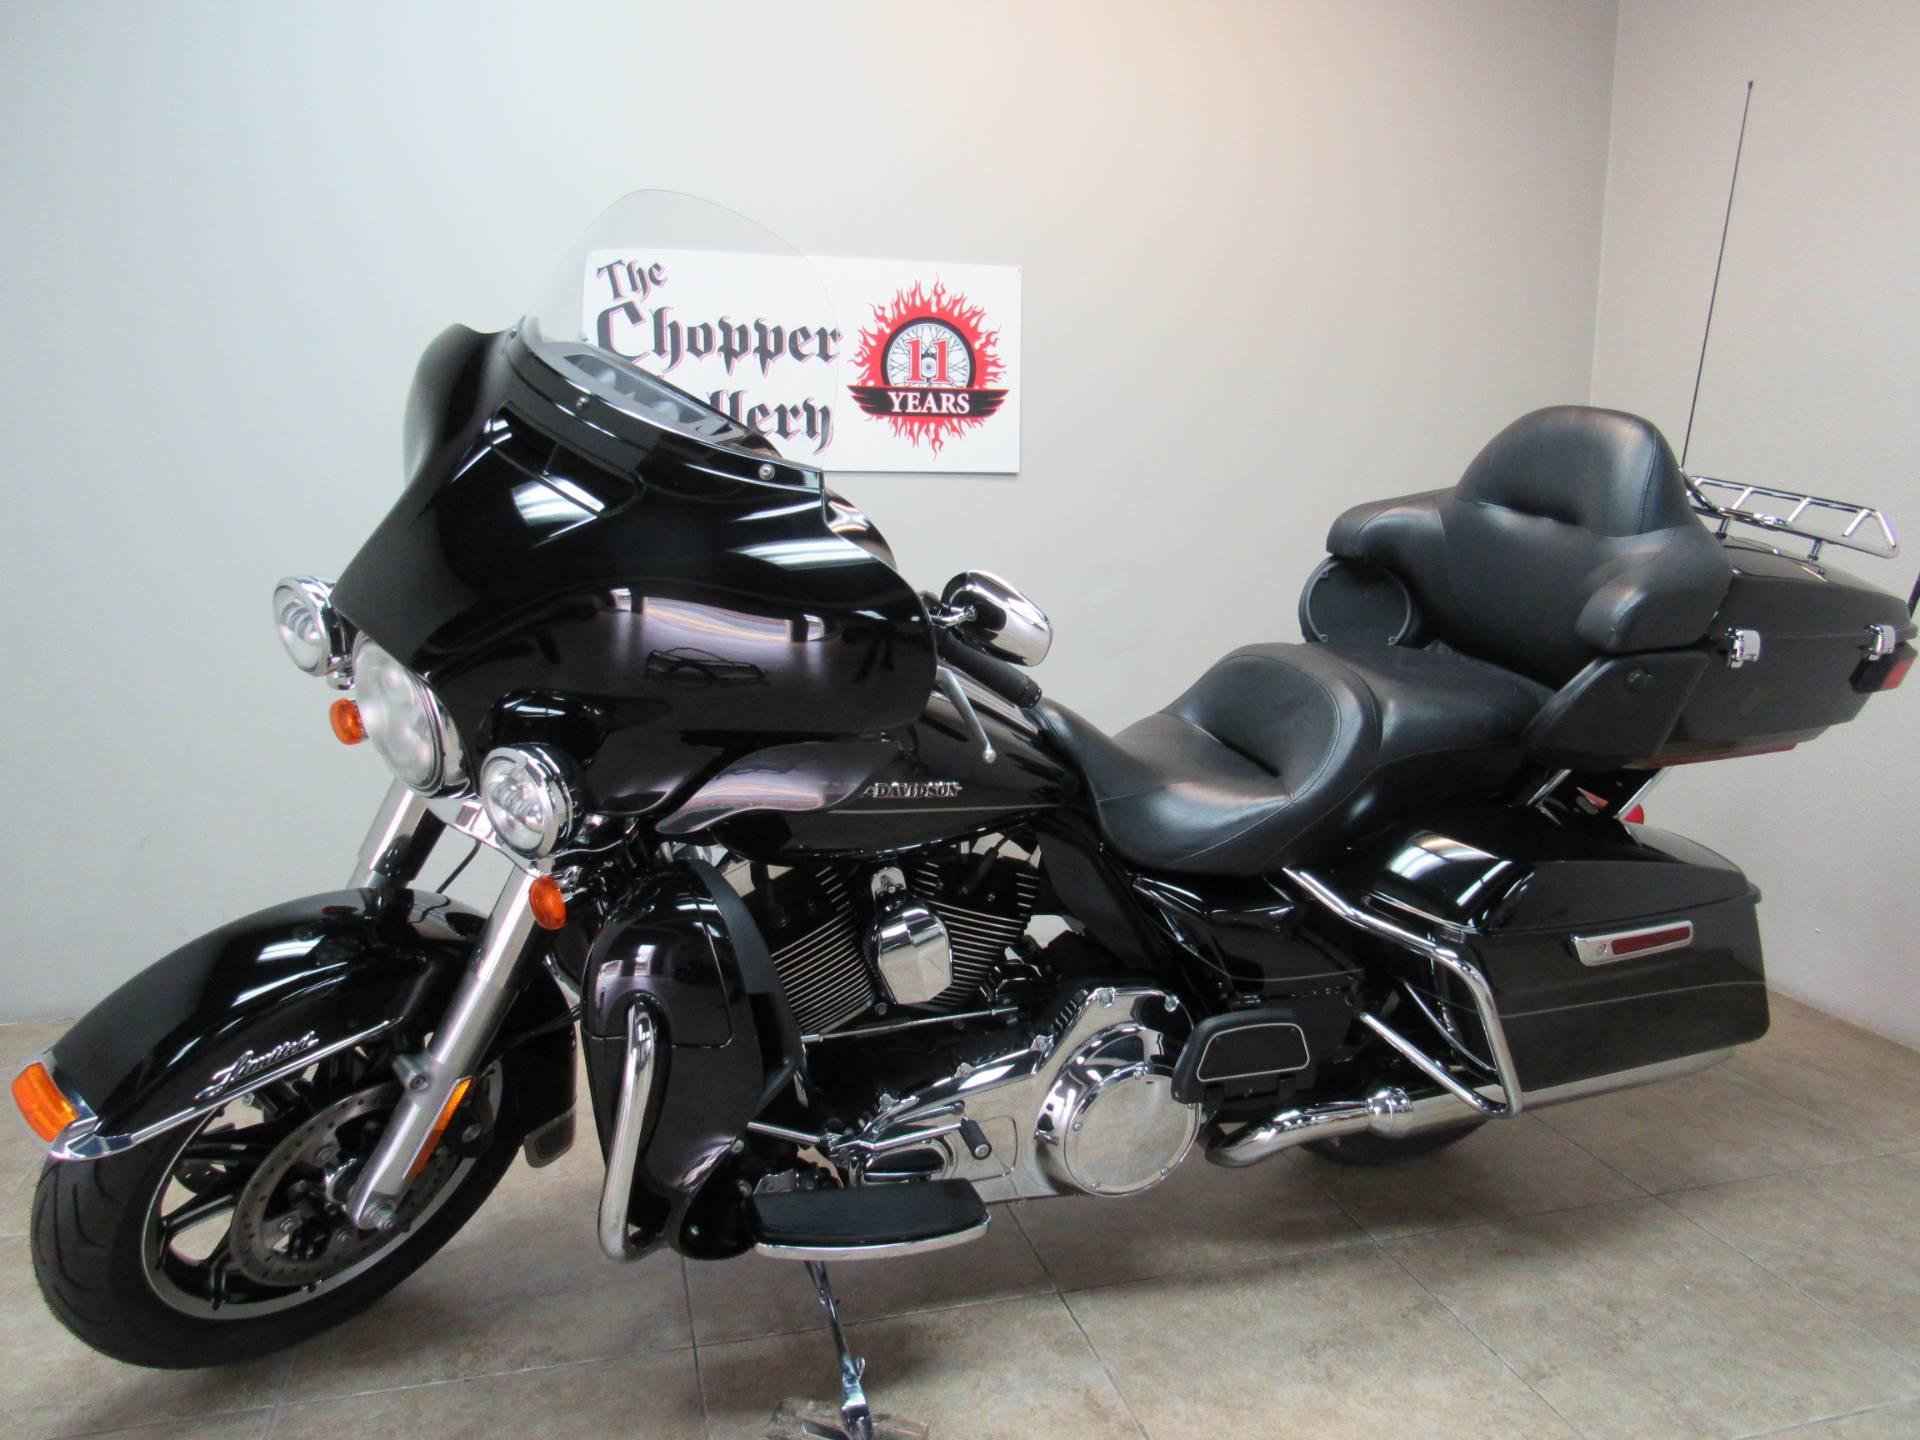 2016 Harley Davidson Ultra Limited In Temecula California